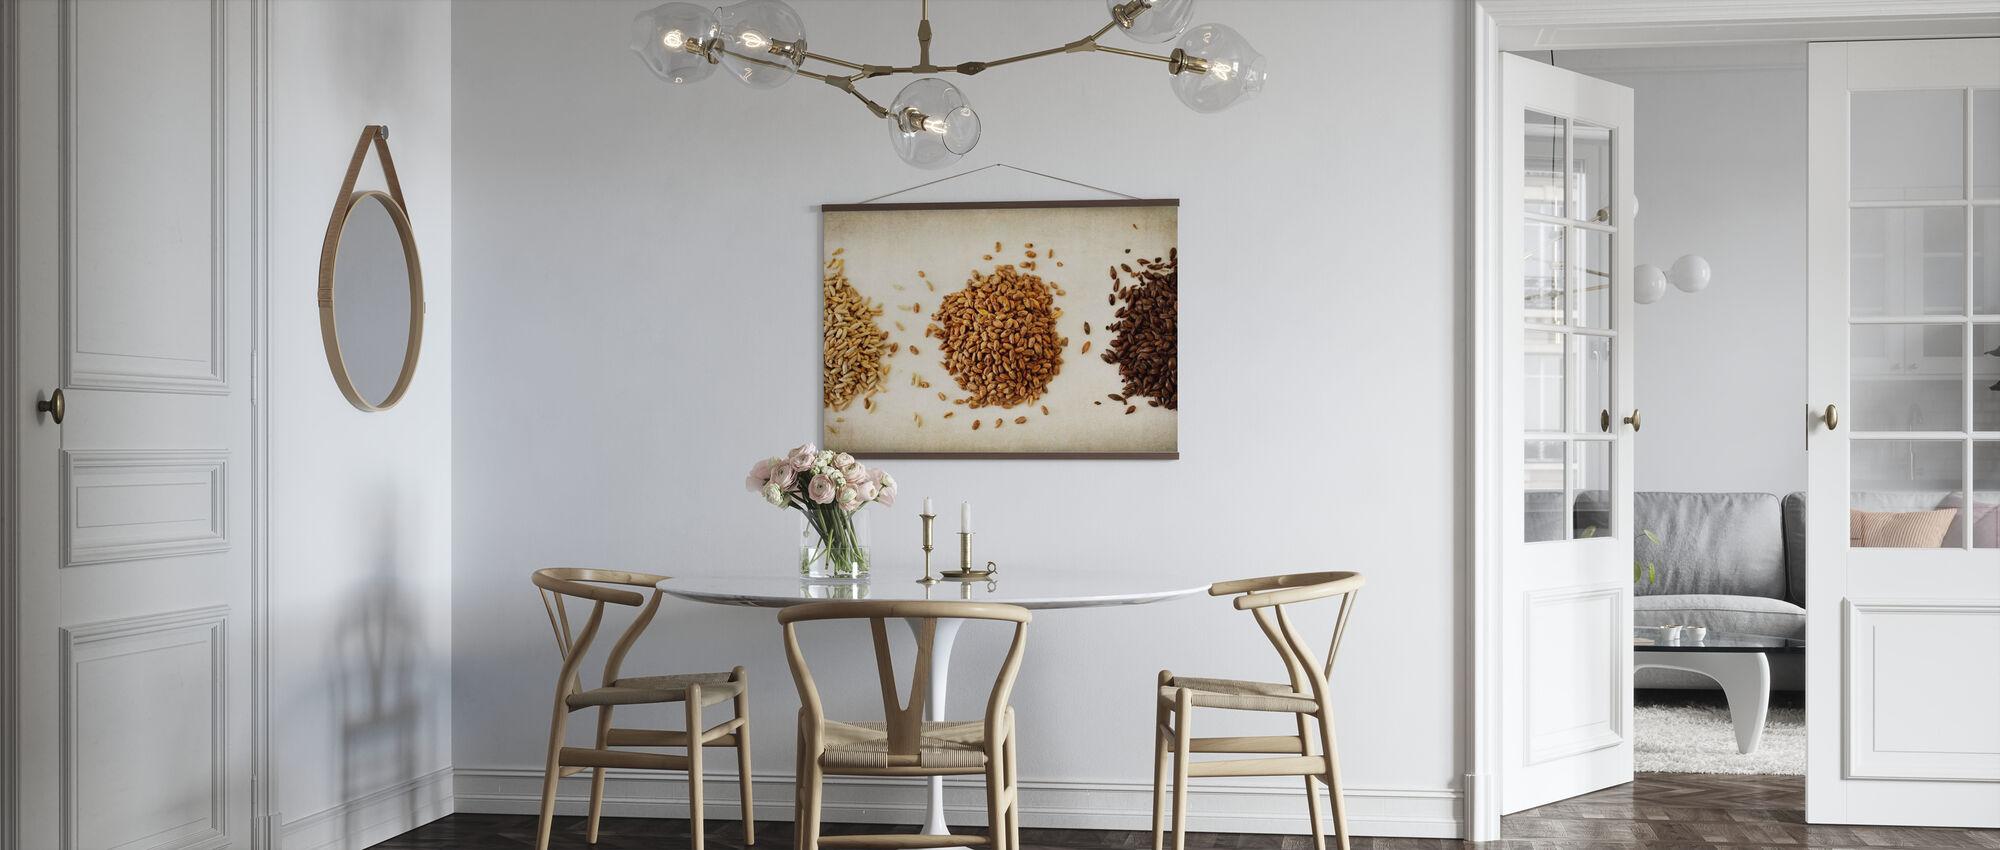 Malt Varieties - Poster - Kitchen